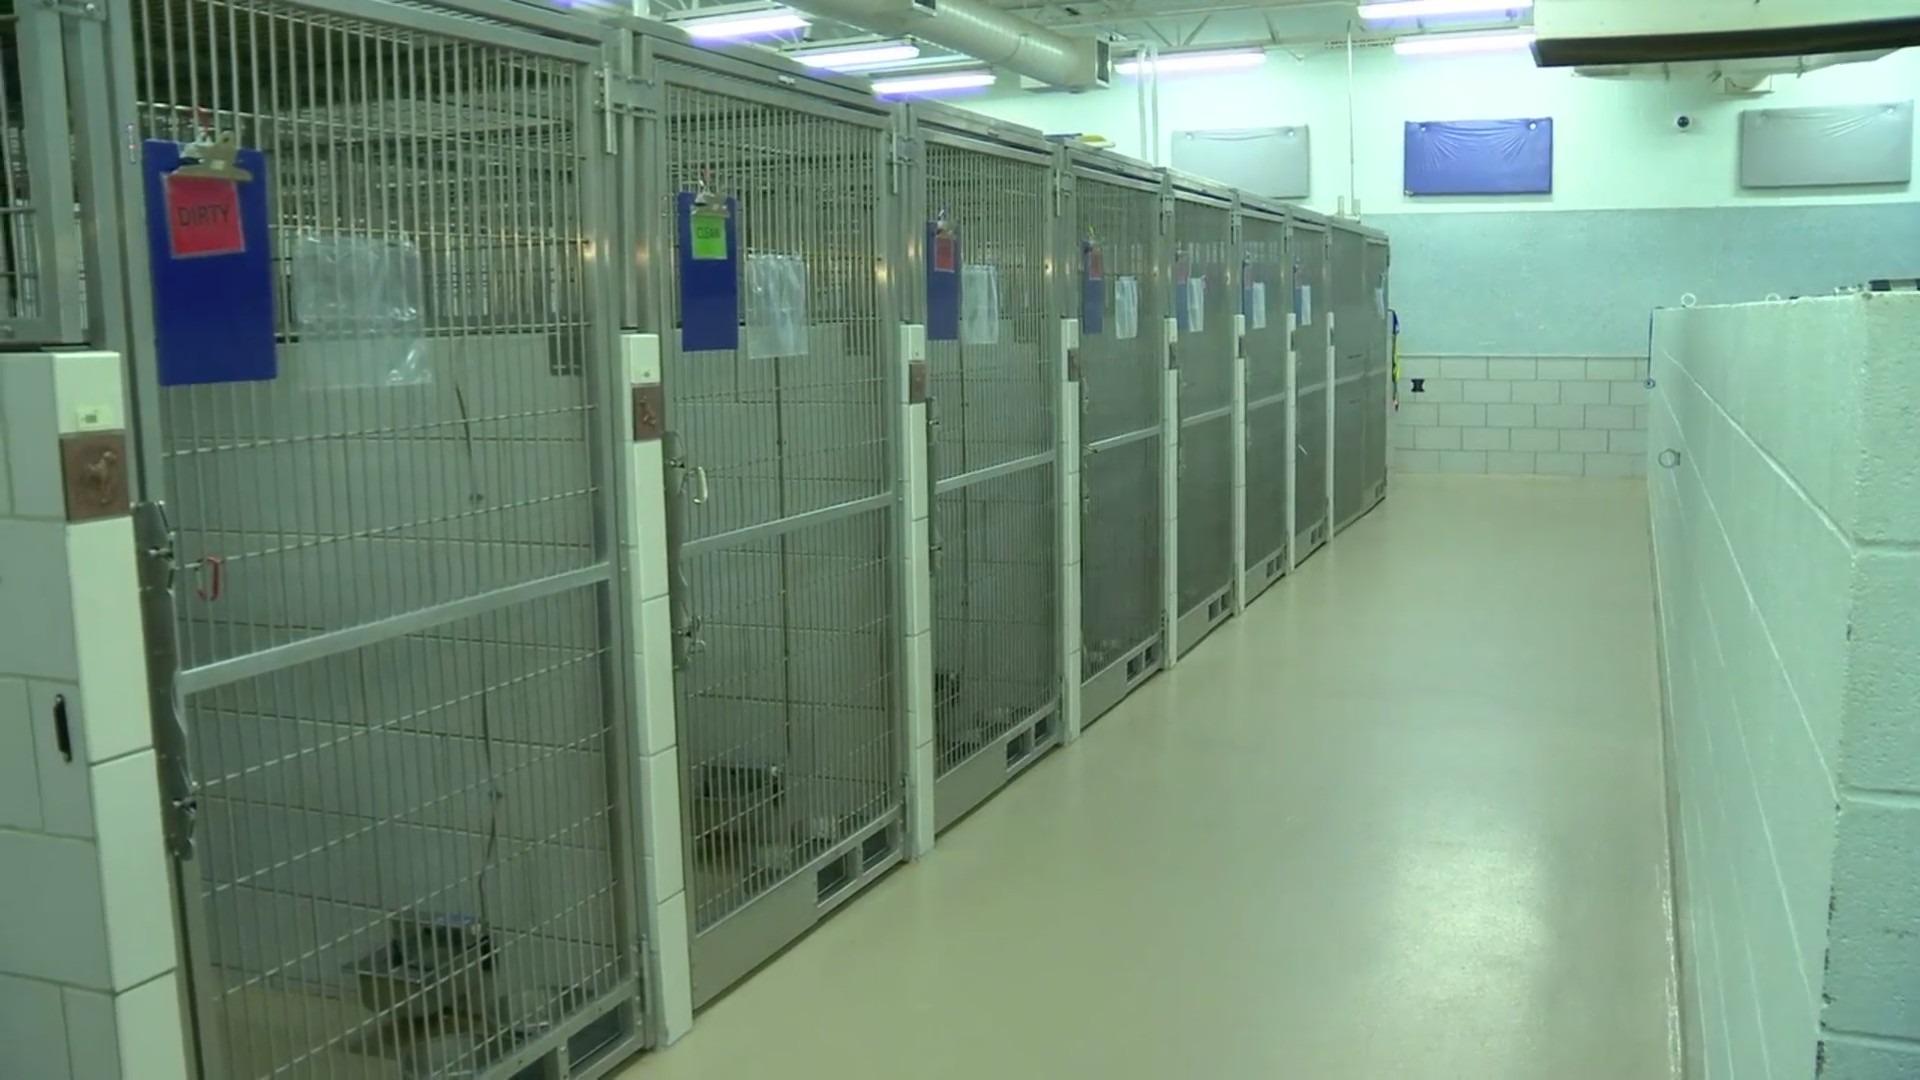 MACC Metro Animal Care and Control generic